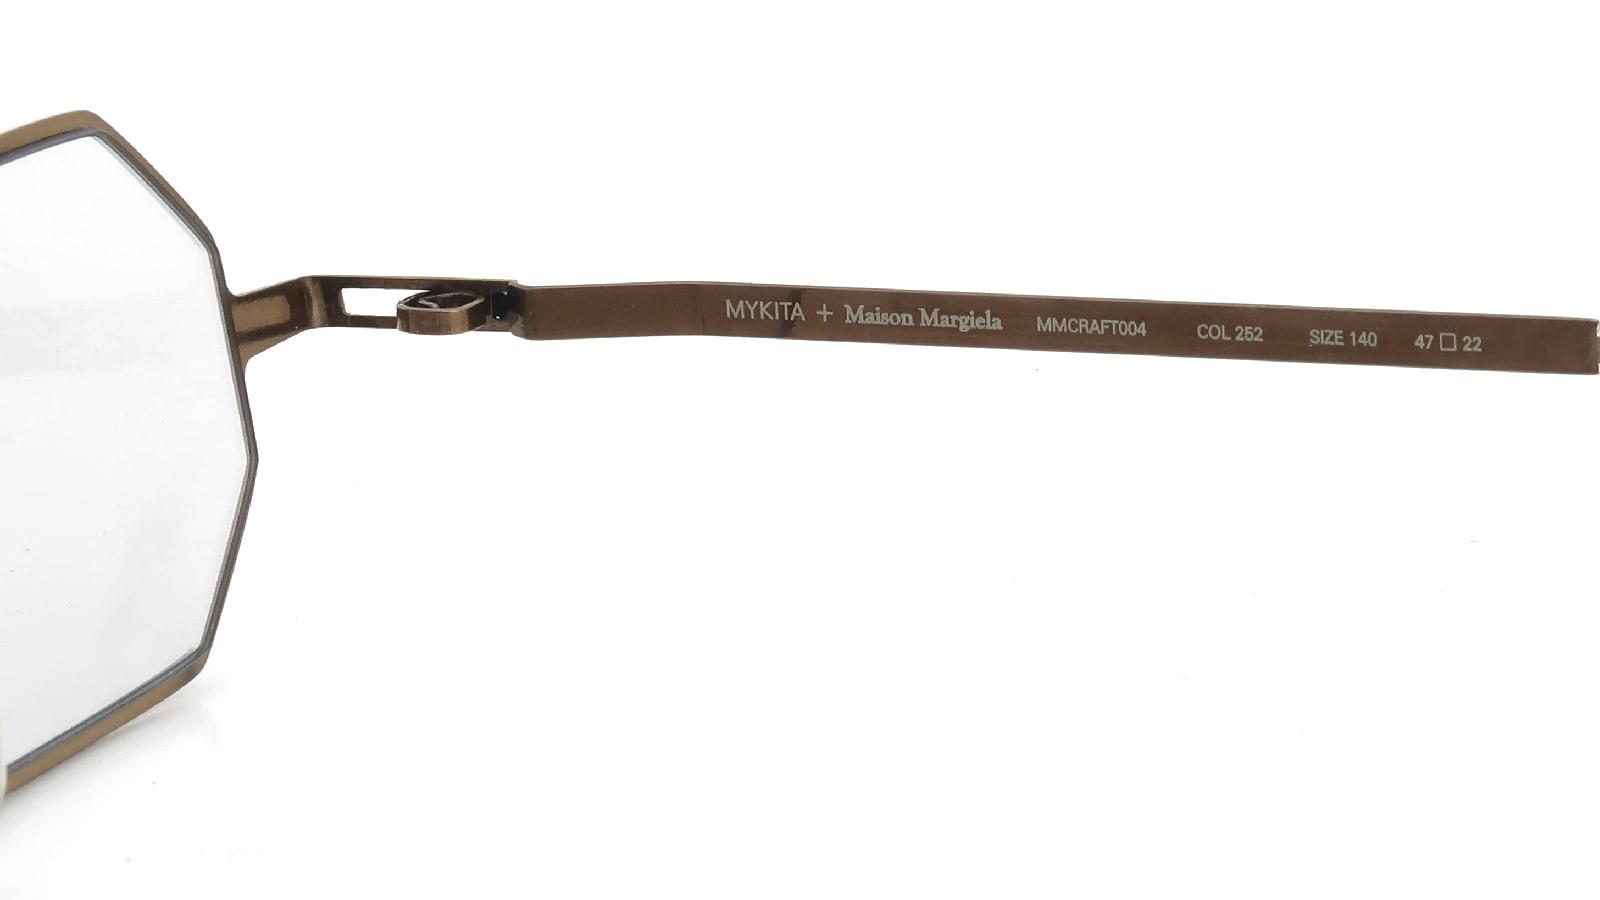 MYKITA + Maison Margiela MMCRAFT004 COL.252 Shiny Copper 10